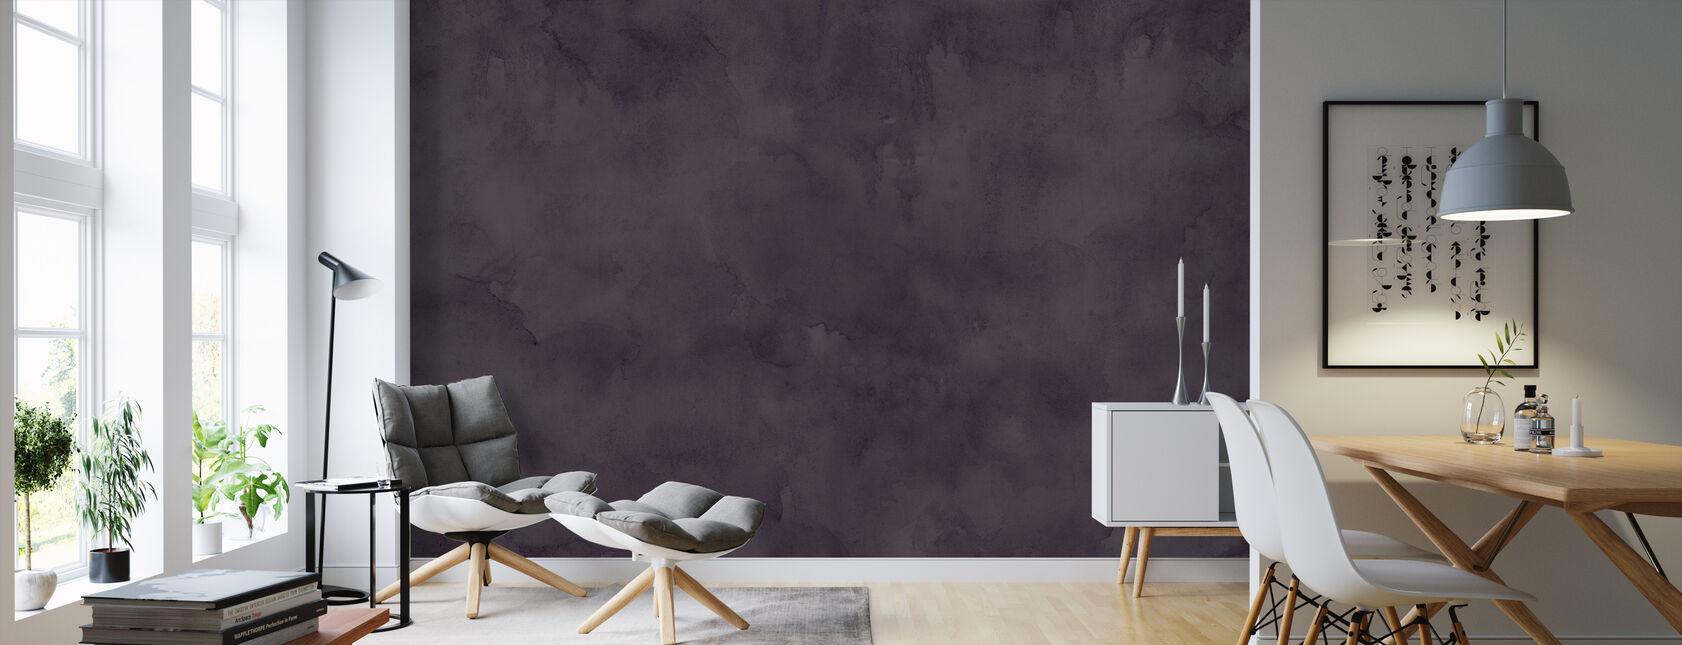 Watercolour - Evening Plum - Wallpaper - Living Room